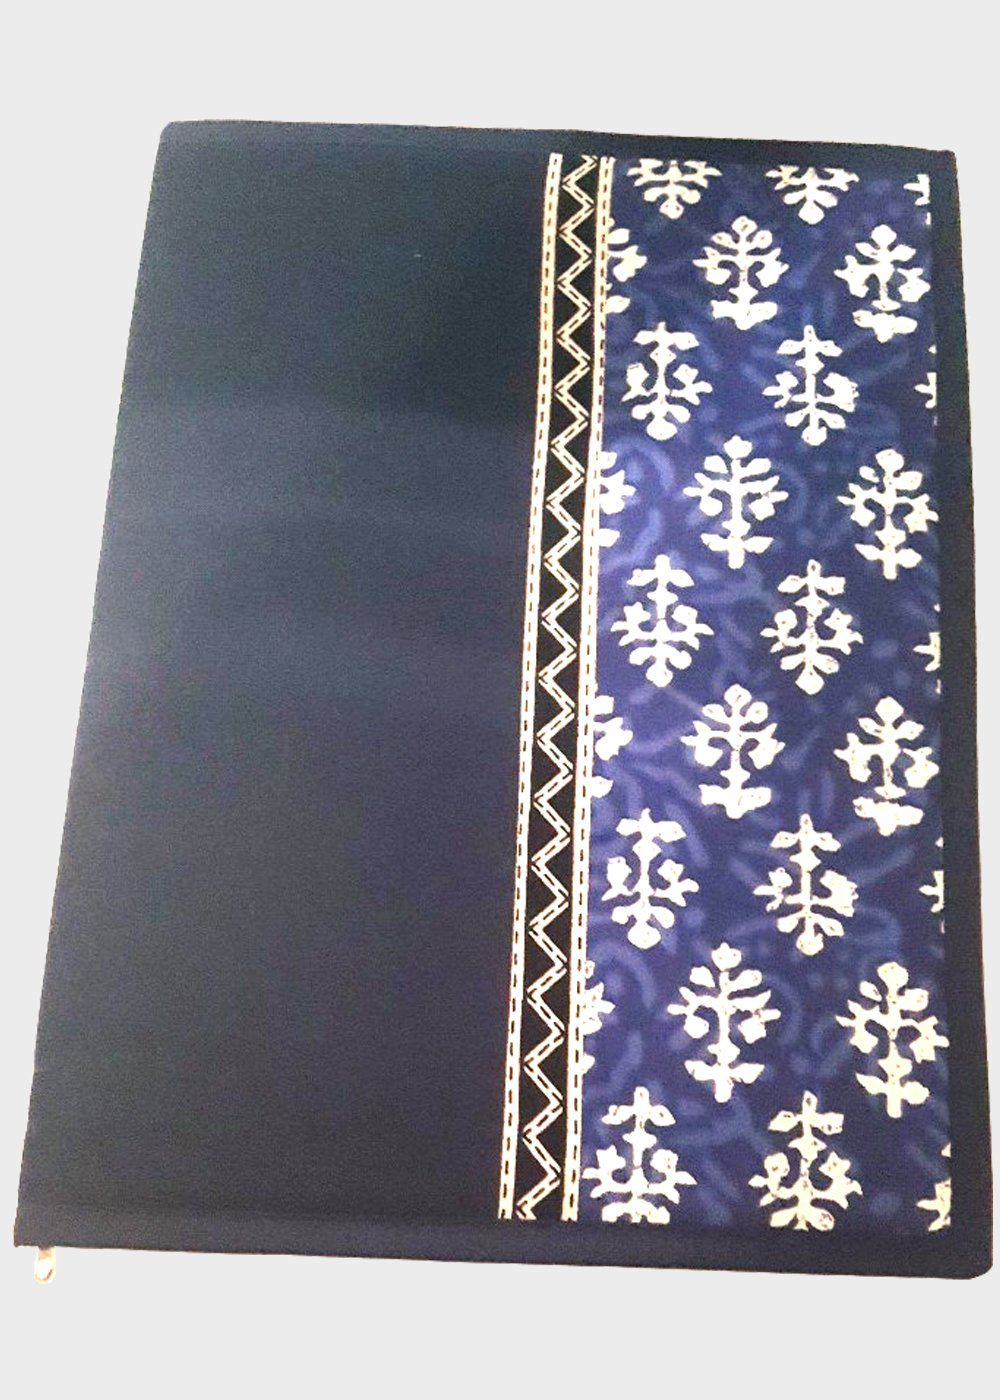 Hand block printed Indigo (Bagru) file folder Blue - Vertical Pattern